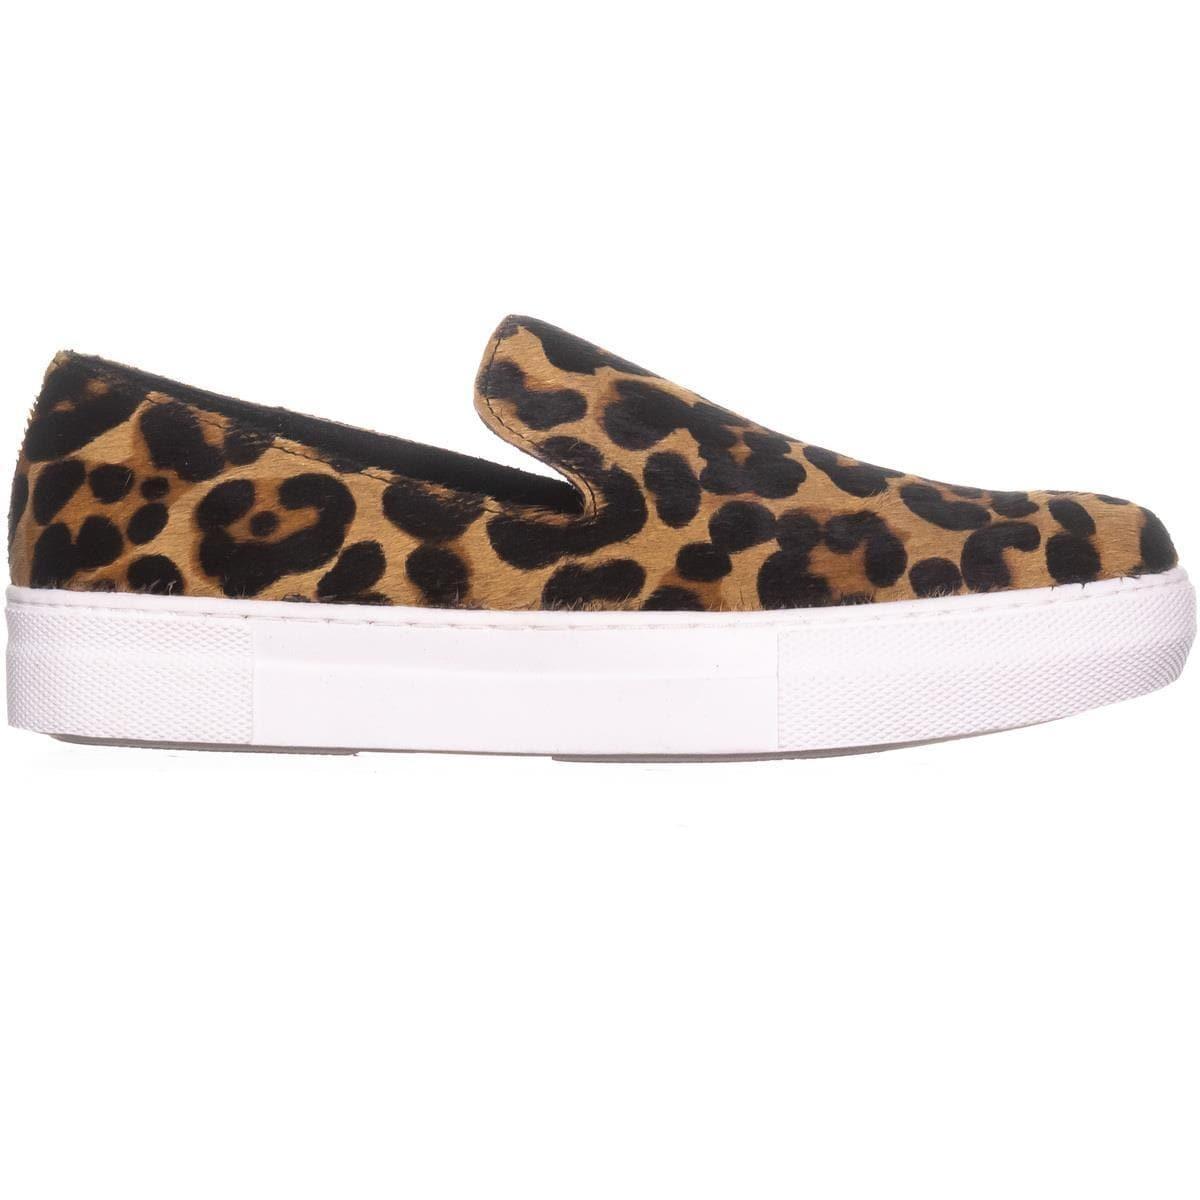 c84a3a2f8e4 Shop STEVEN Steve Madden Arden Slip On Fashion Sneakers